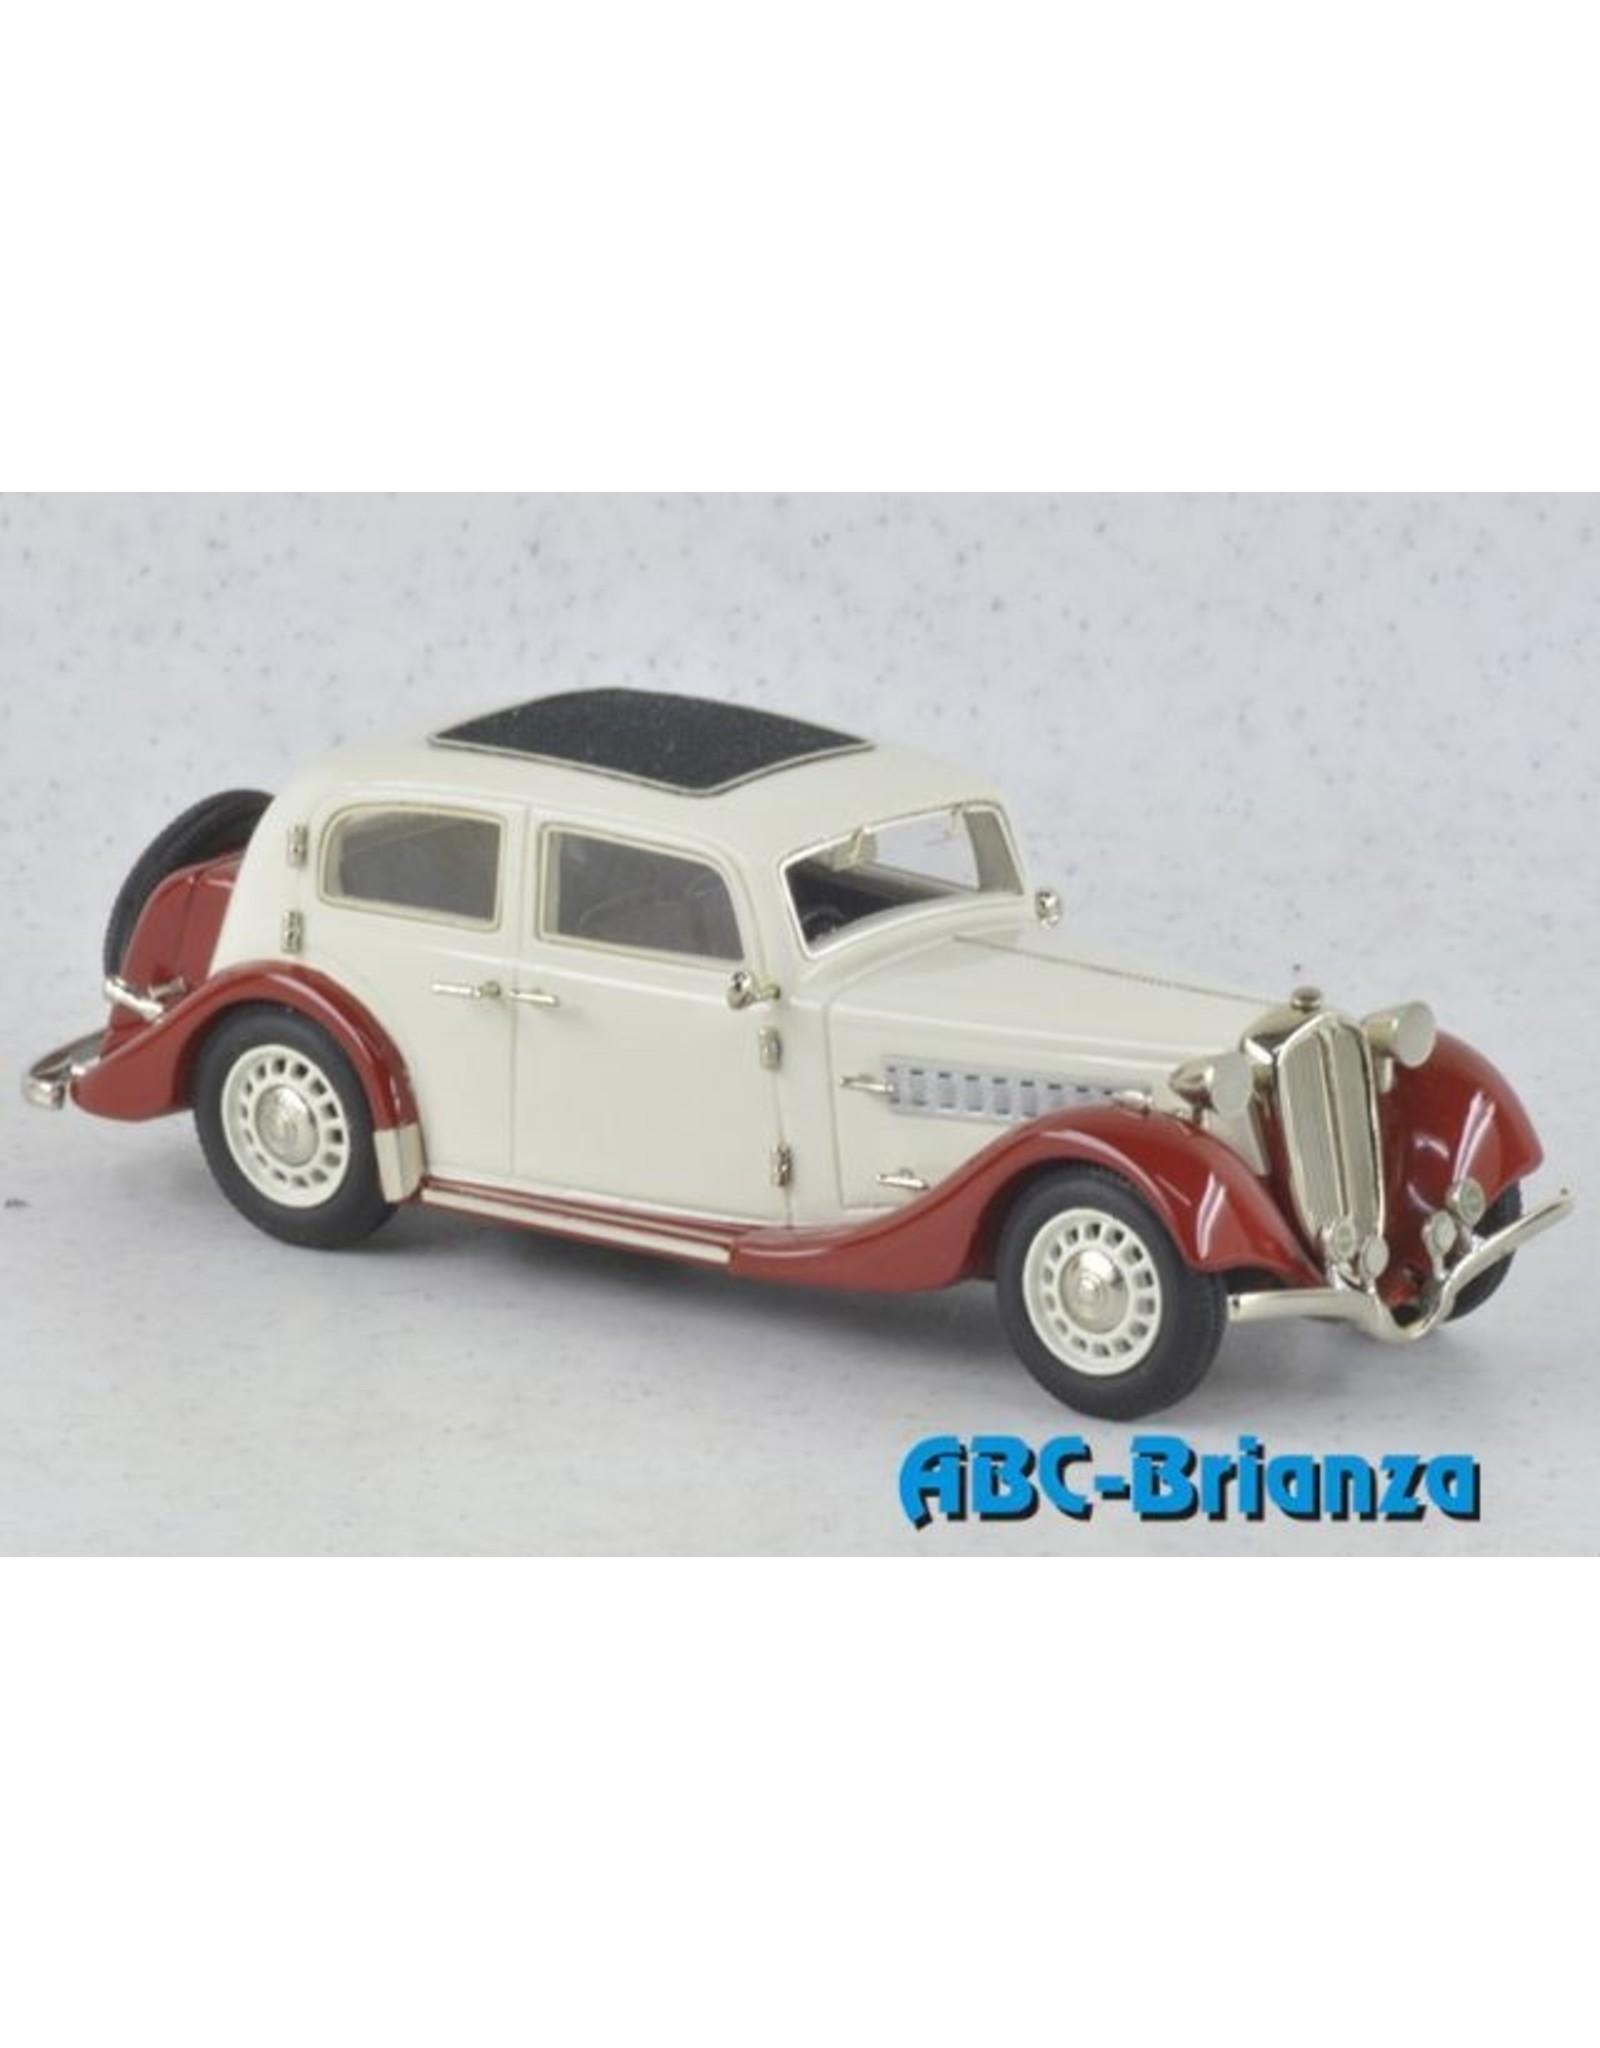 Delahaye DELAHAYE 134N AUTOBINEAU-1934(white/red).